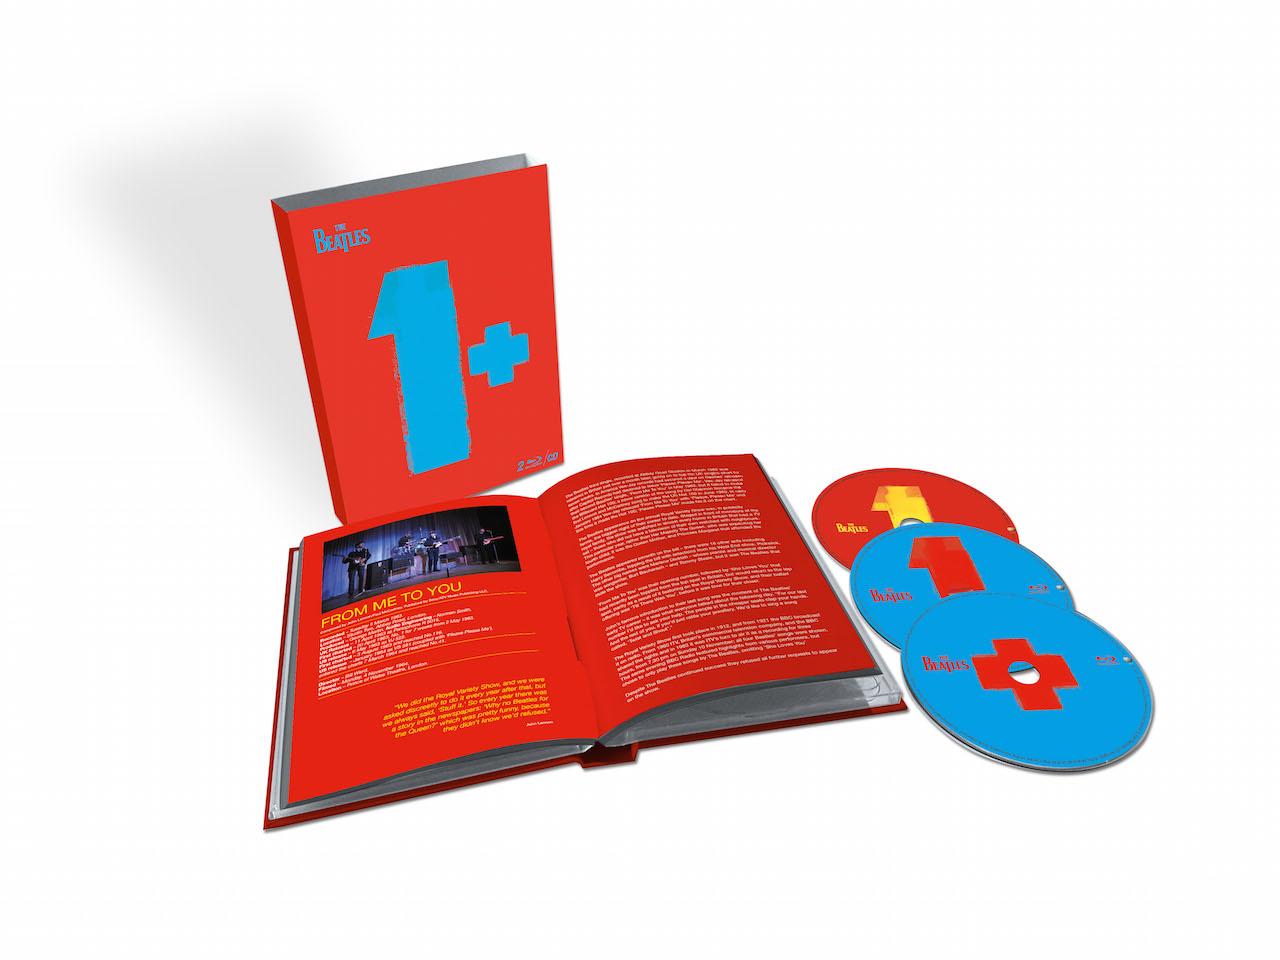 The Beatles 1 - Deluxe BluRay 3D